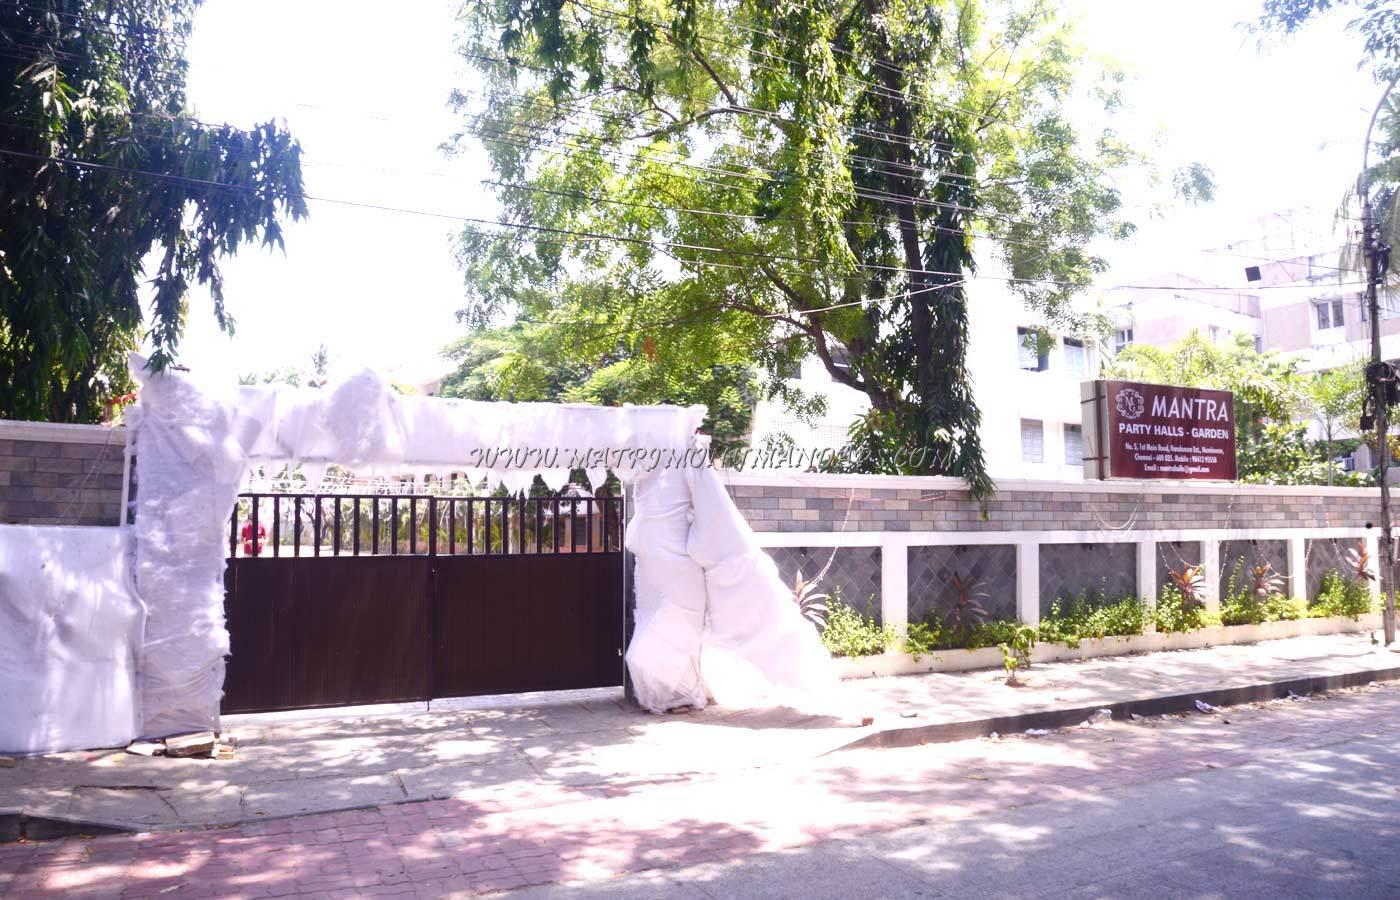 Find More Banquet Halls in Nandanam